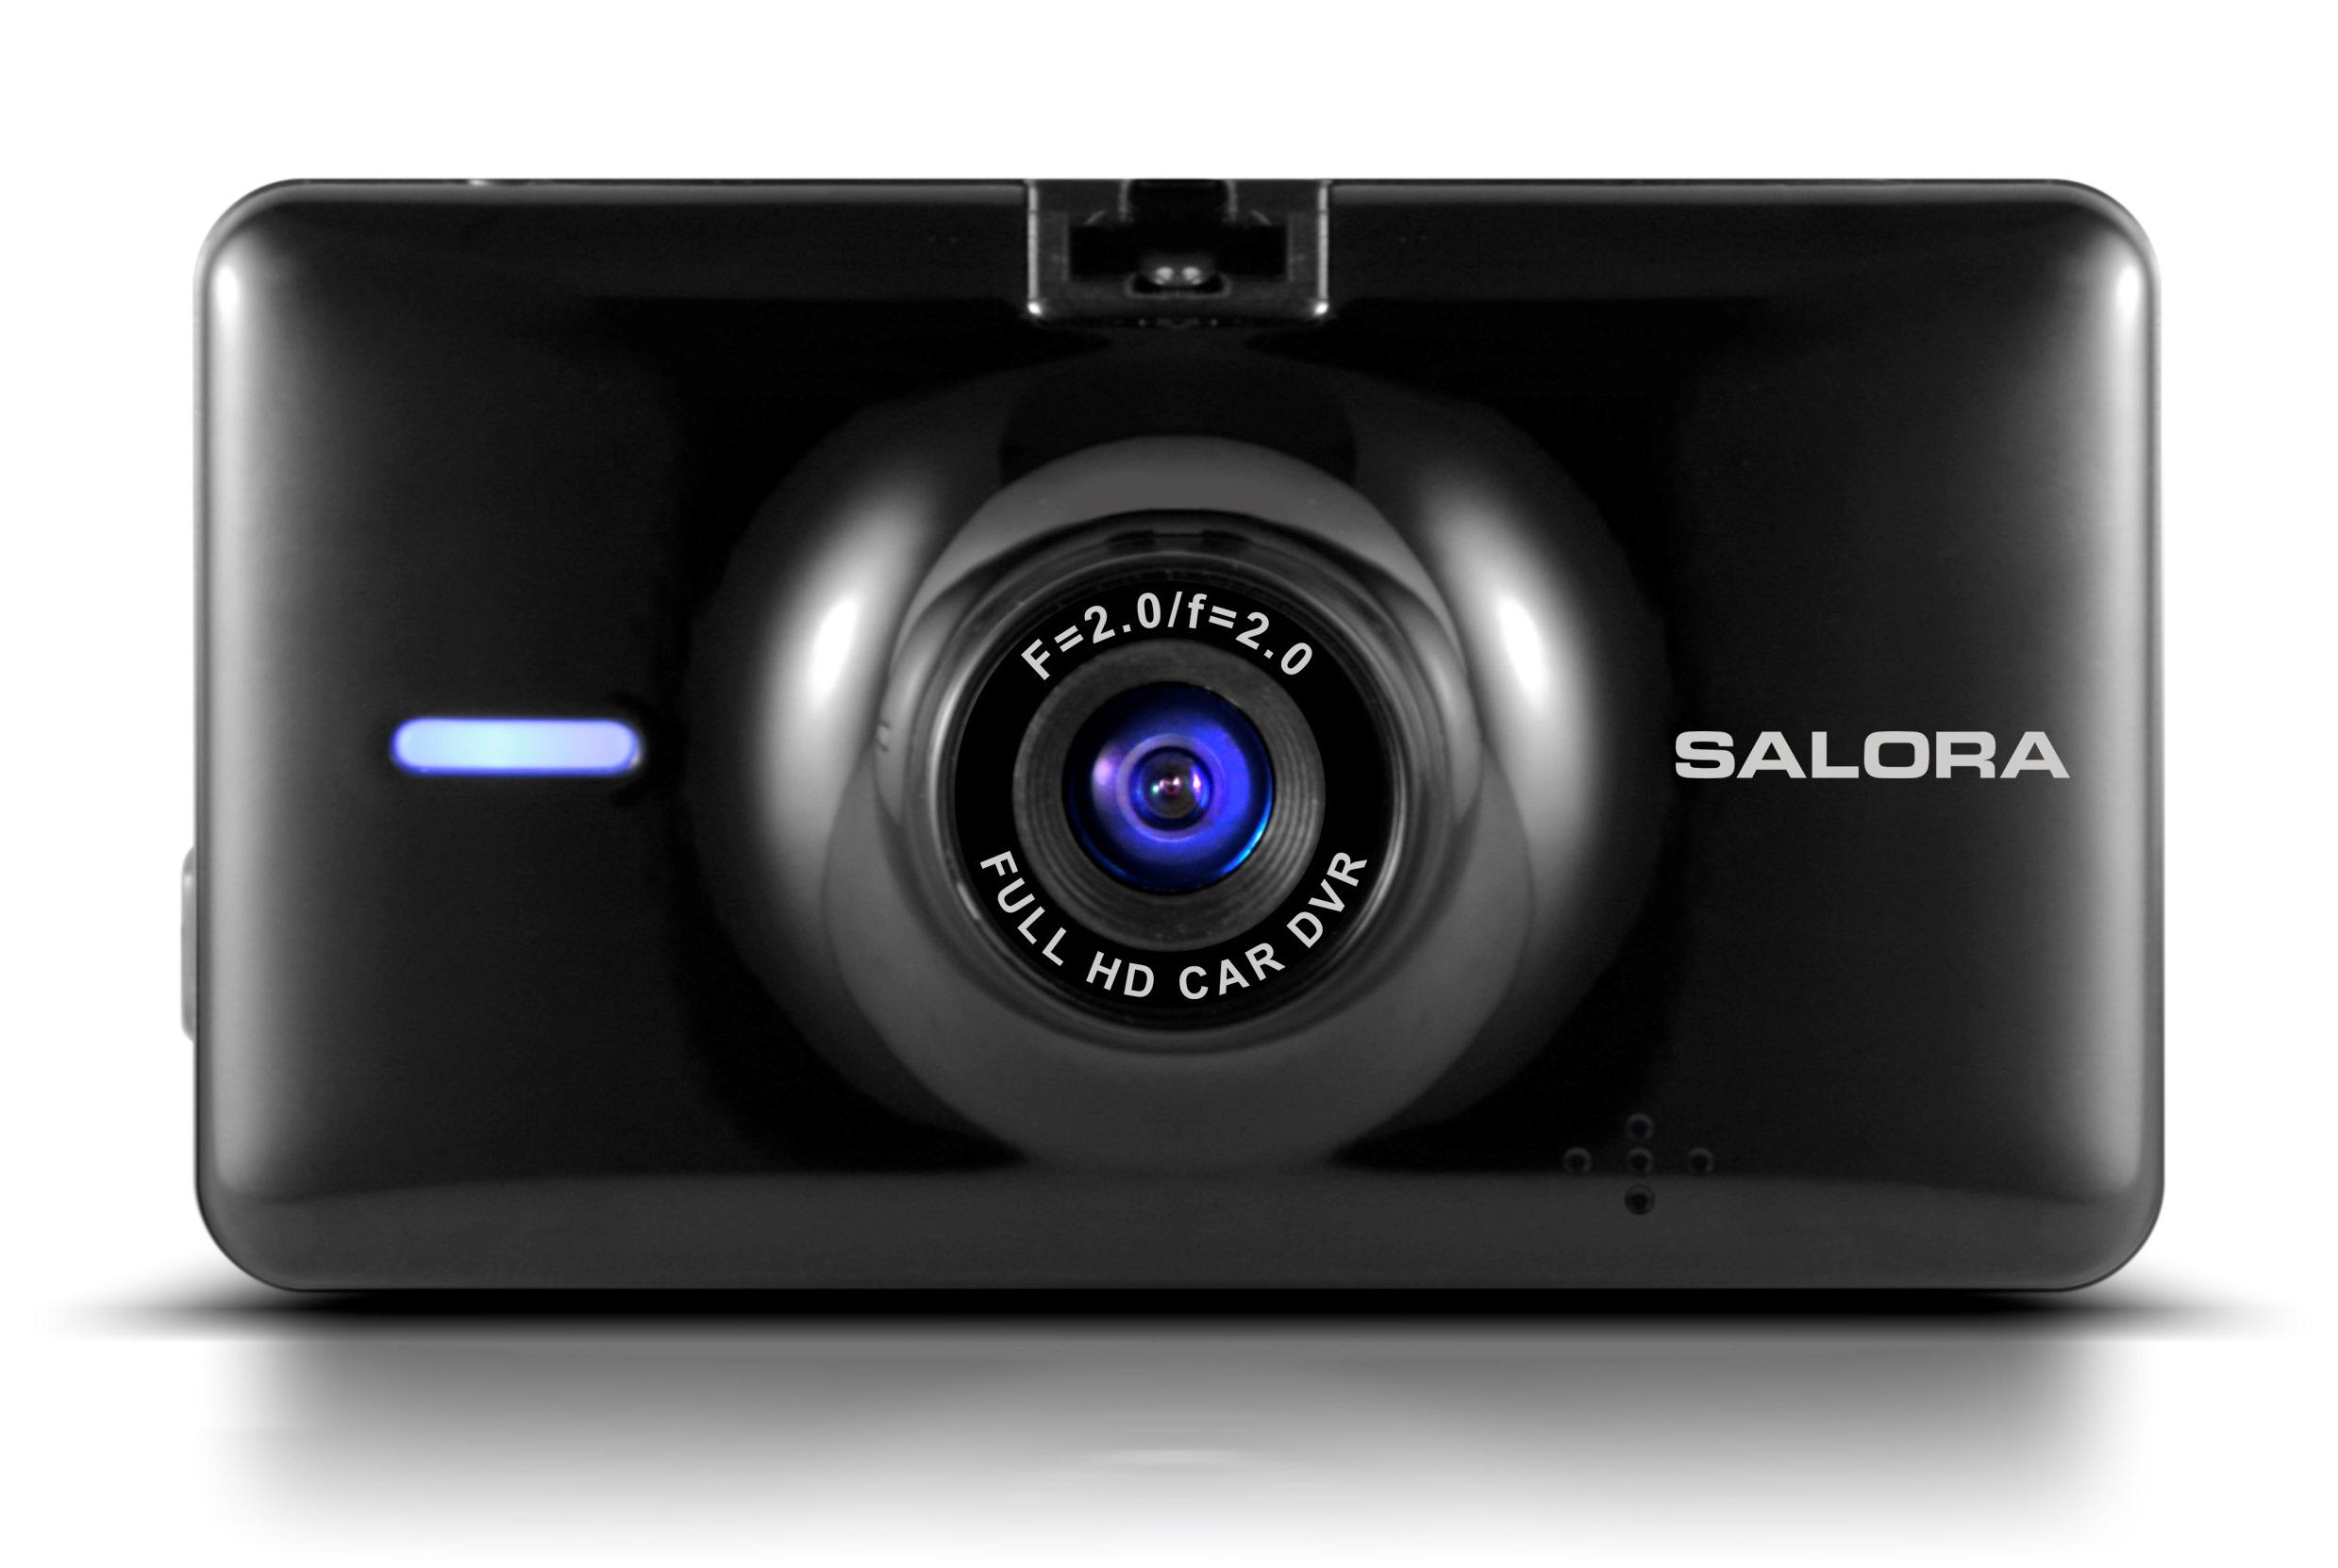 Image of Salora CDC1350FD